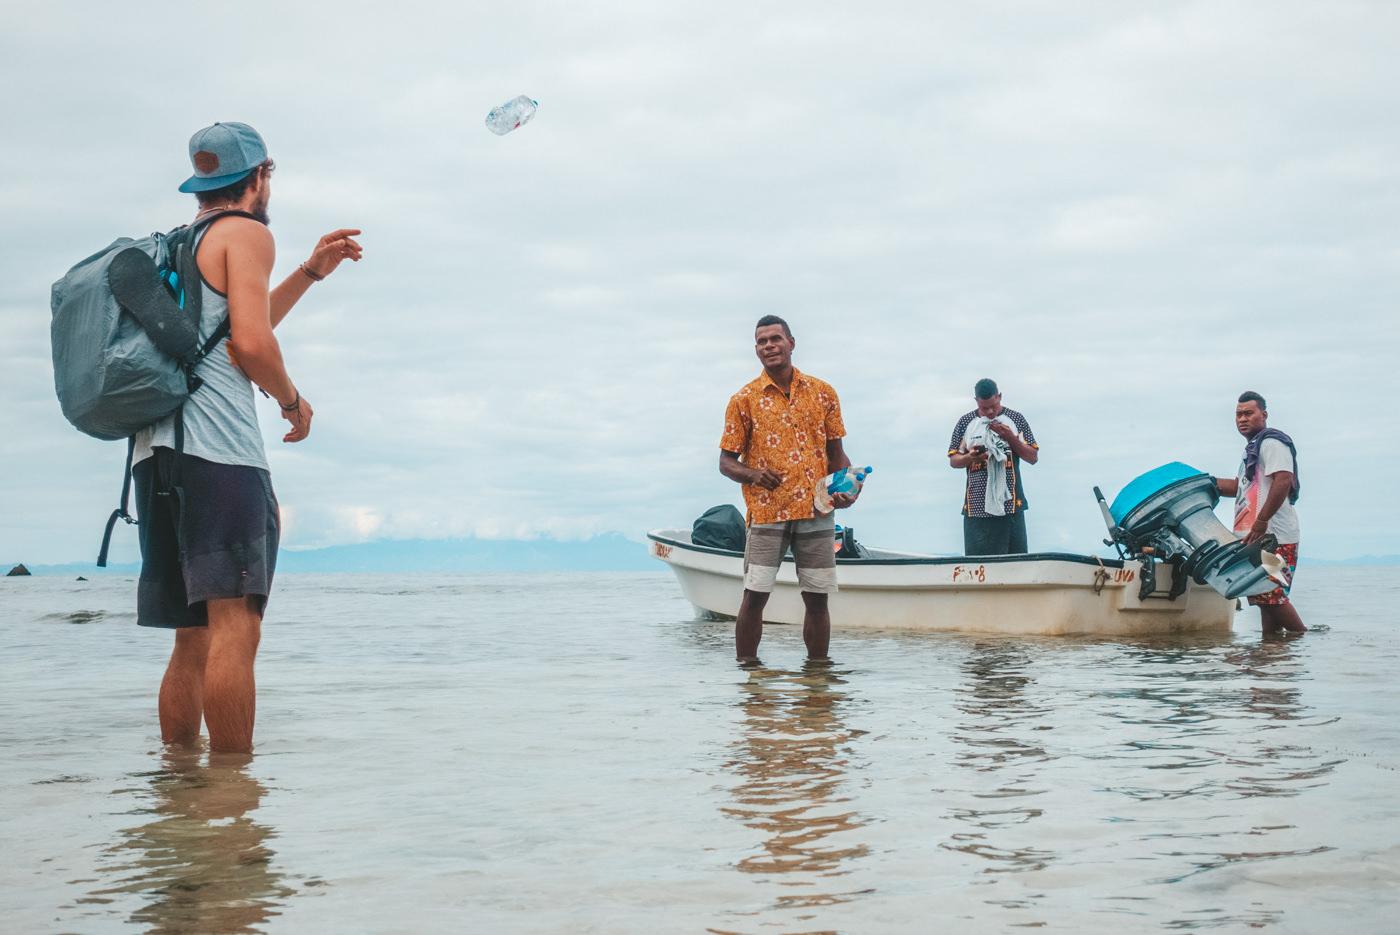 Matthias belädt das Boot